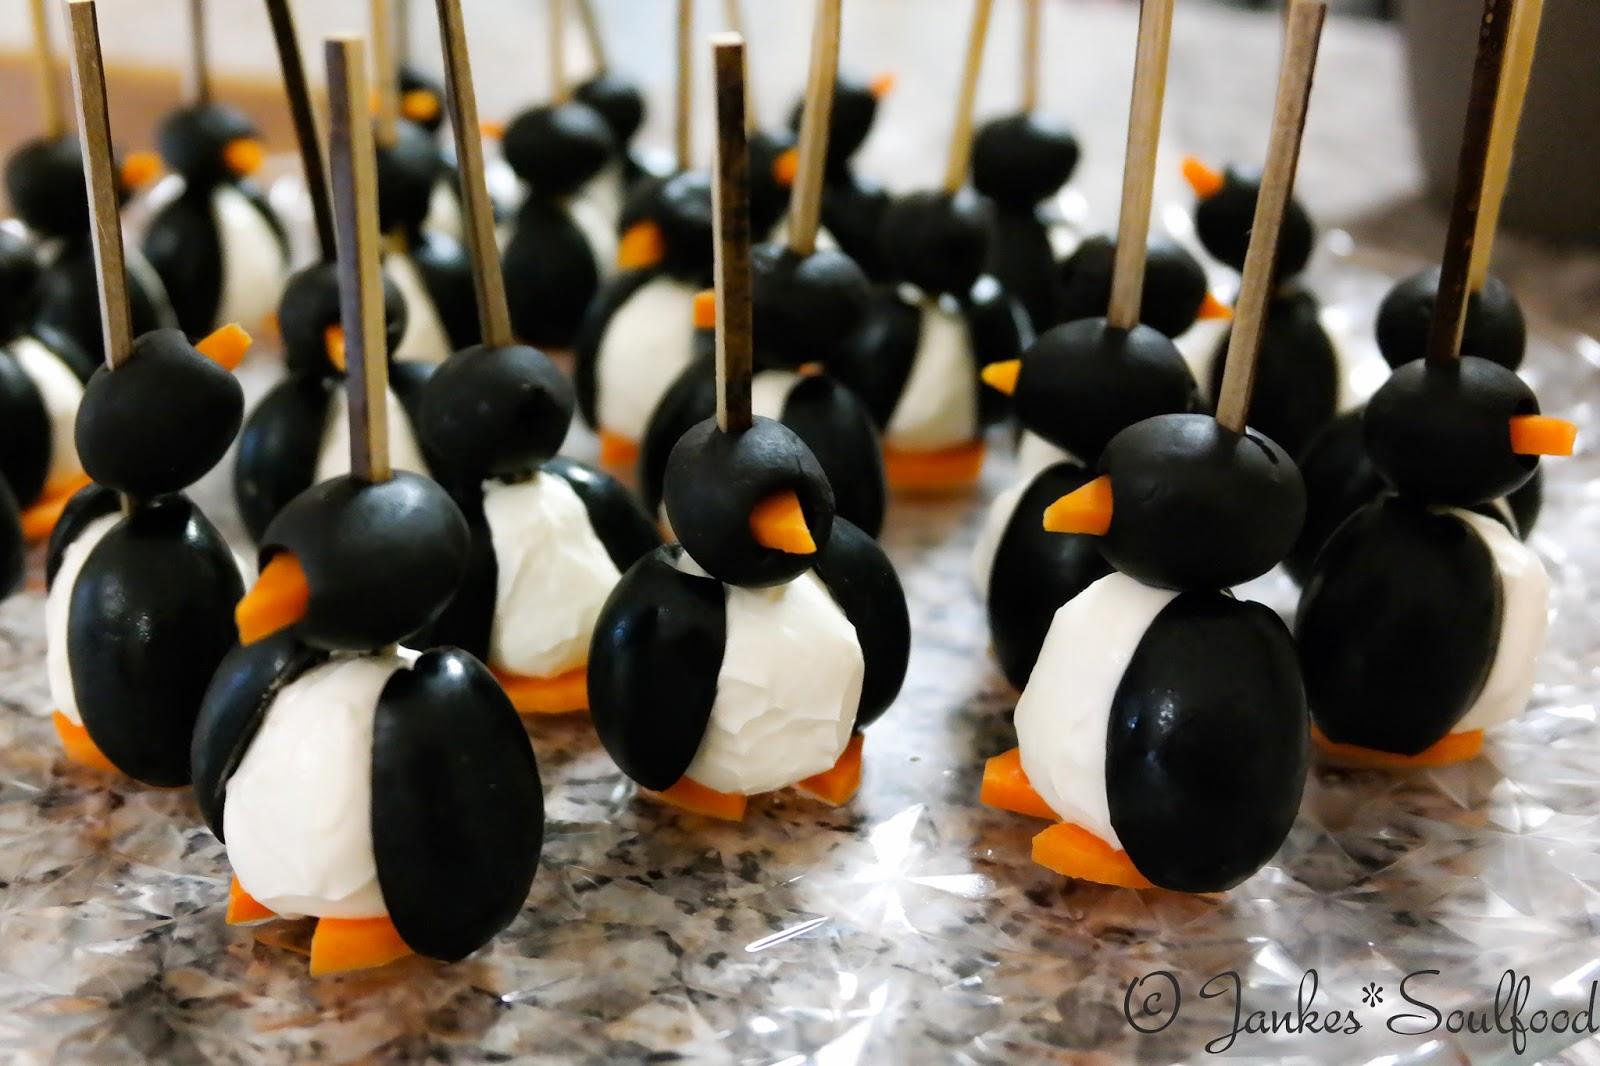 Jankes*Soulfood : Kleine Fingerfood Pinguine